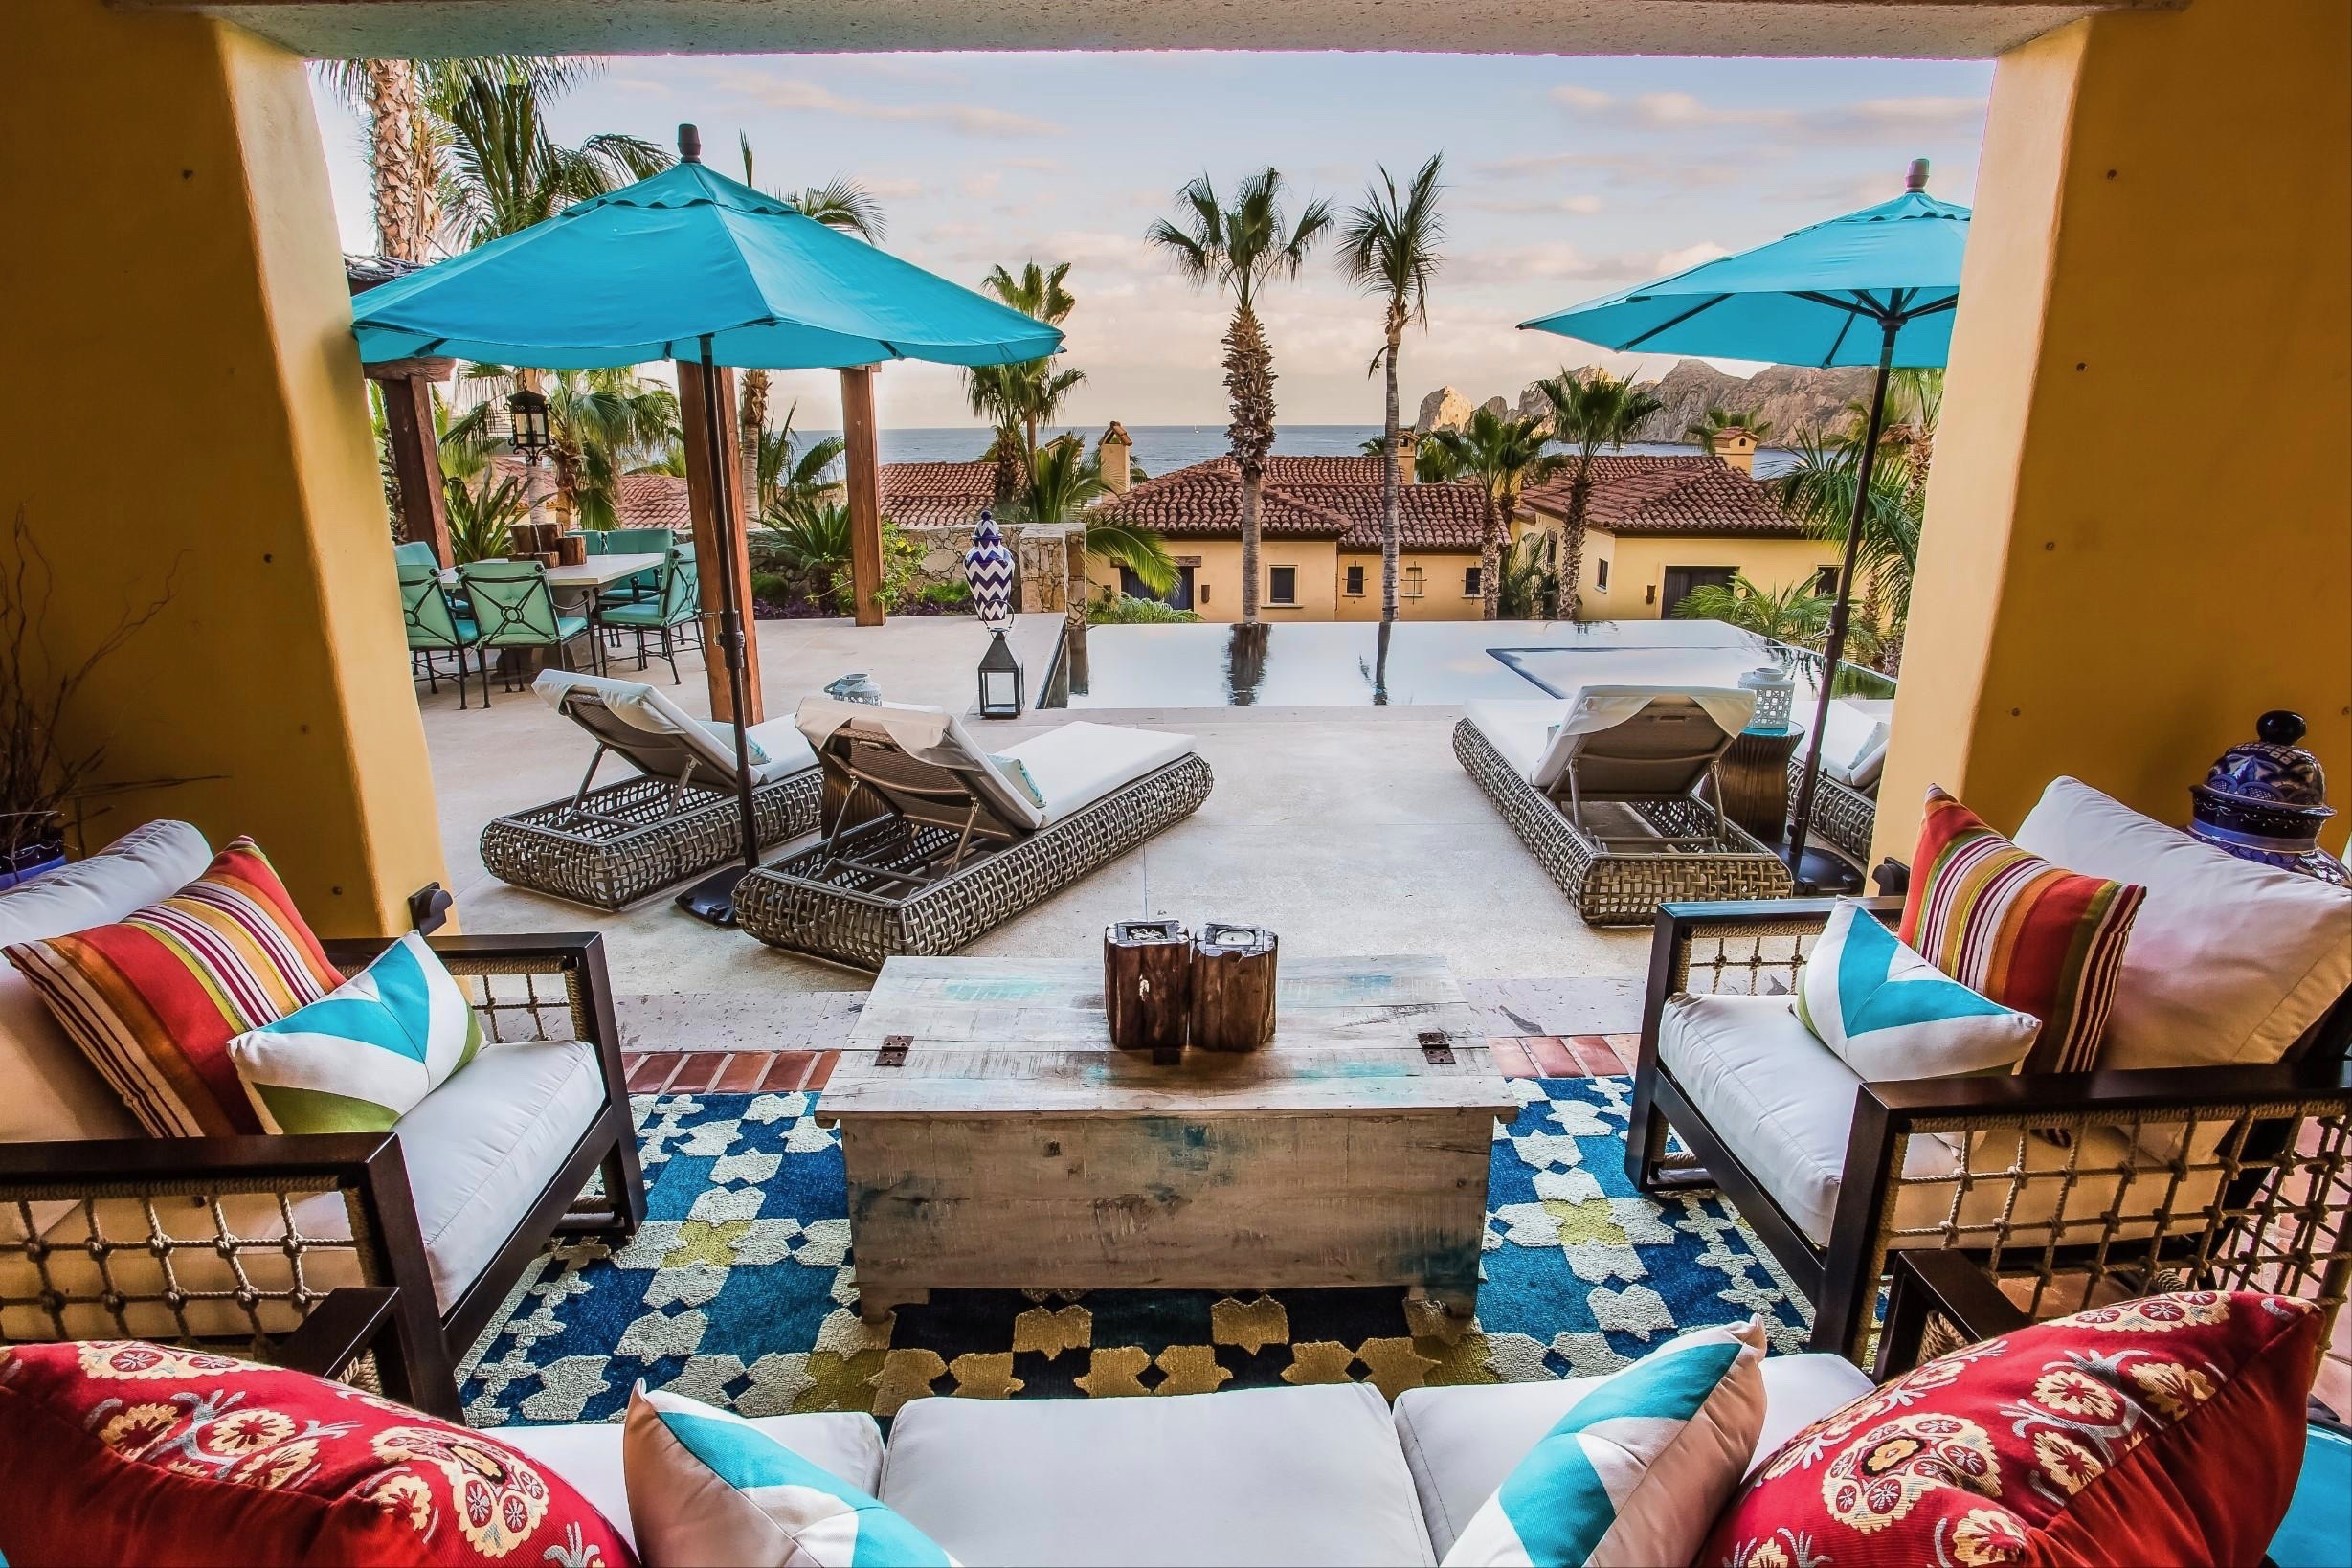 A view of the pool in a veranda unit at Hacienda